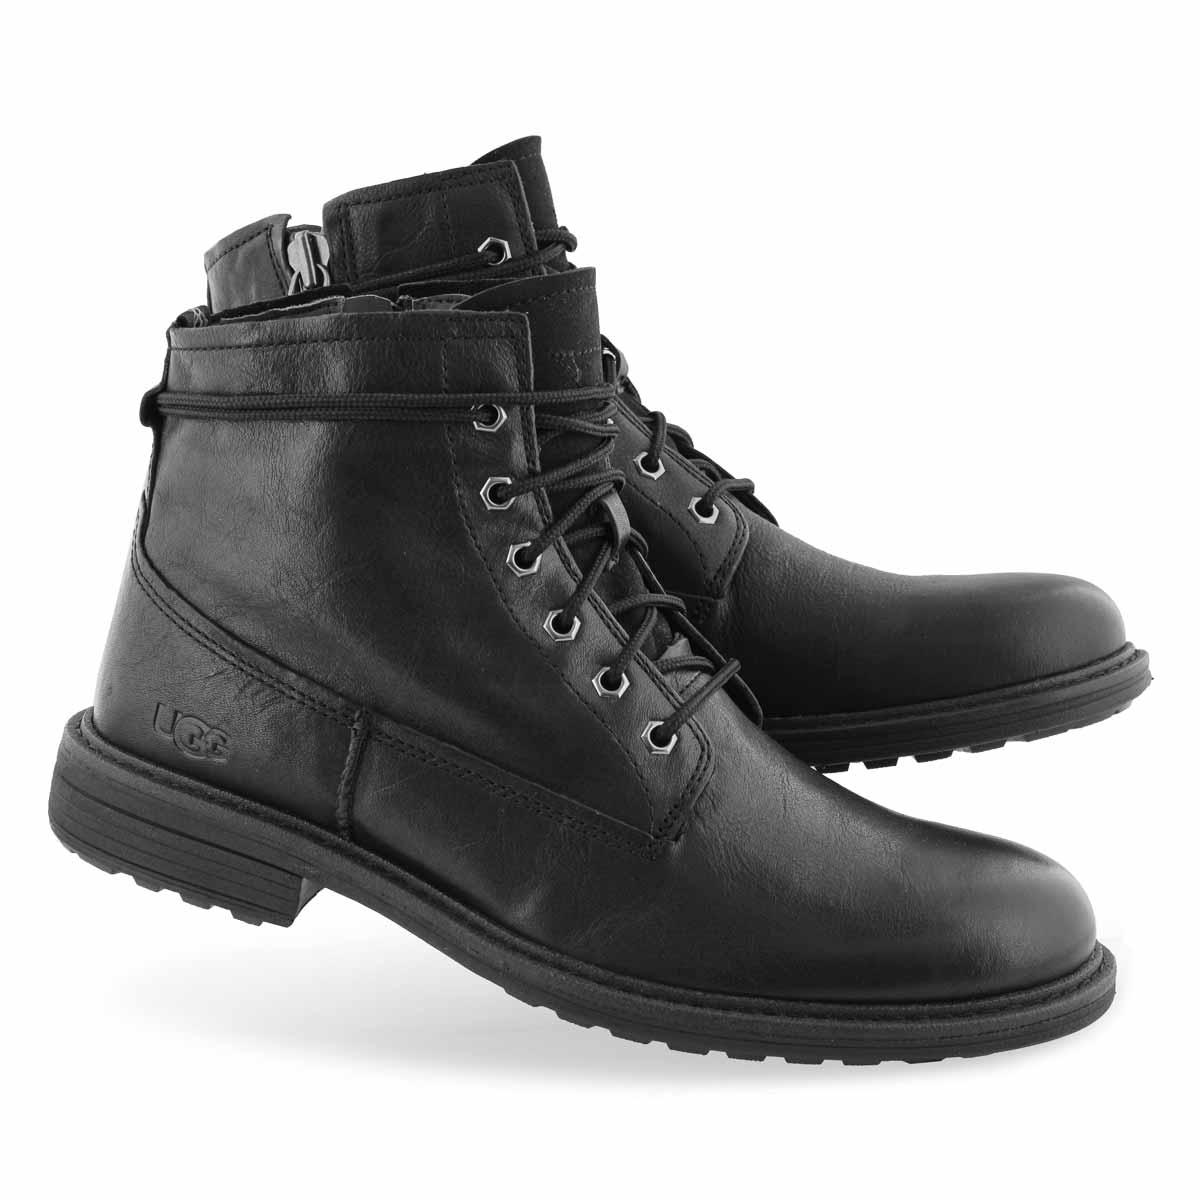 Mns Morrison black lace up ankle boot